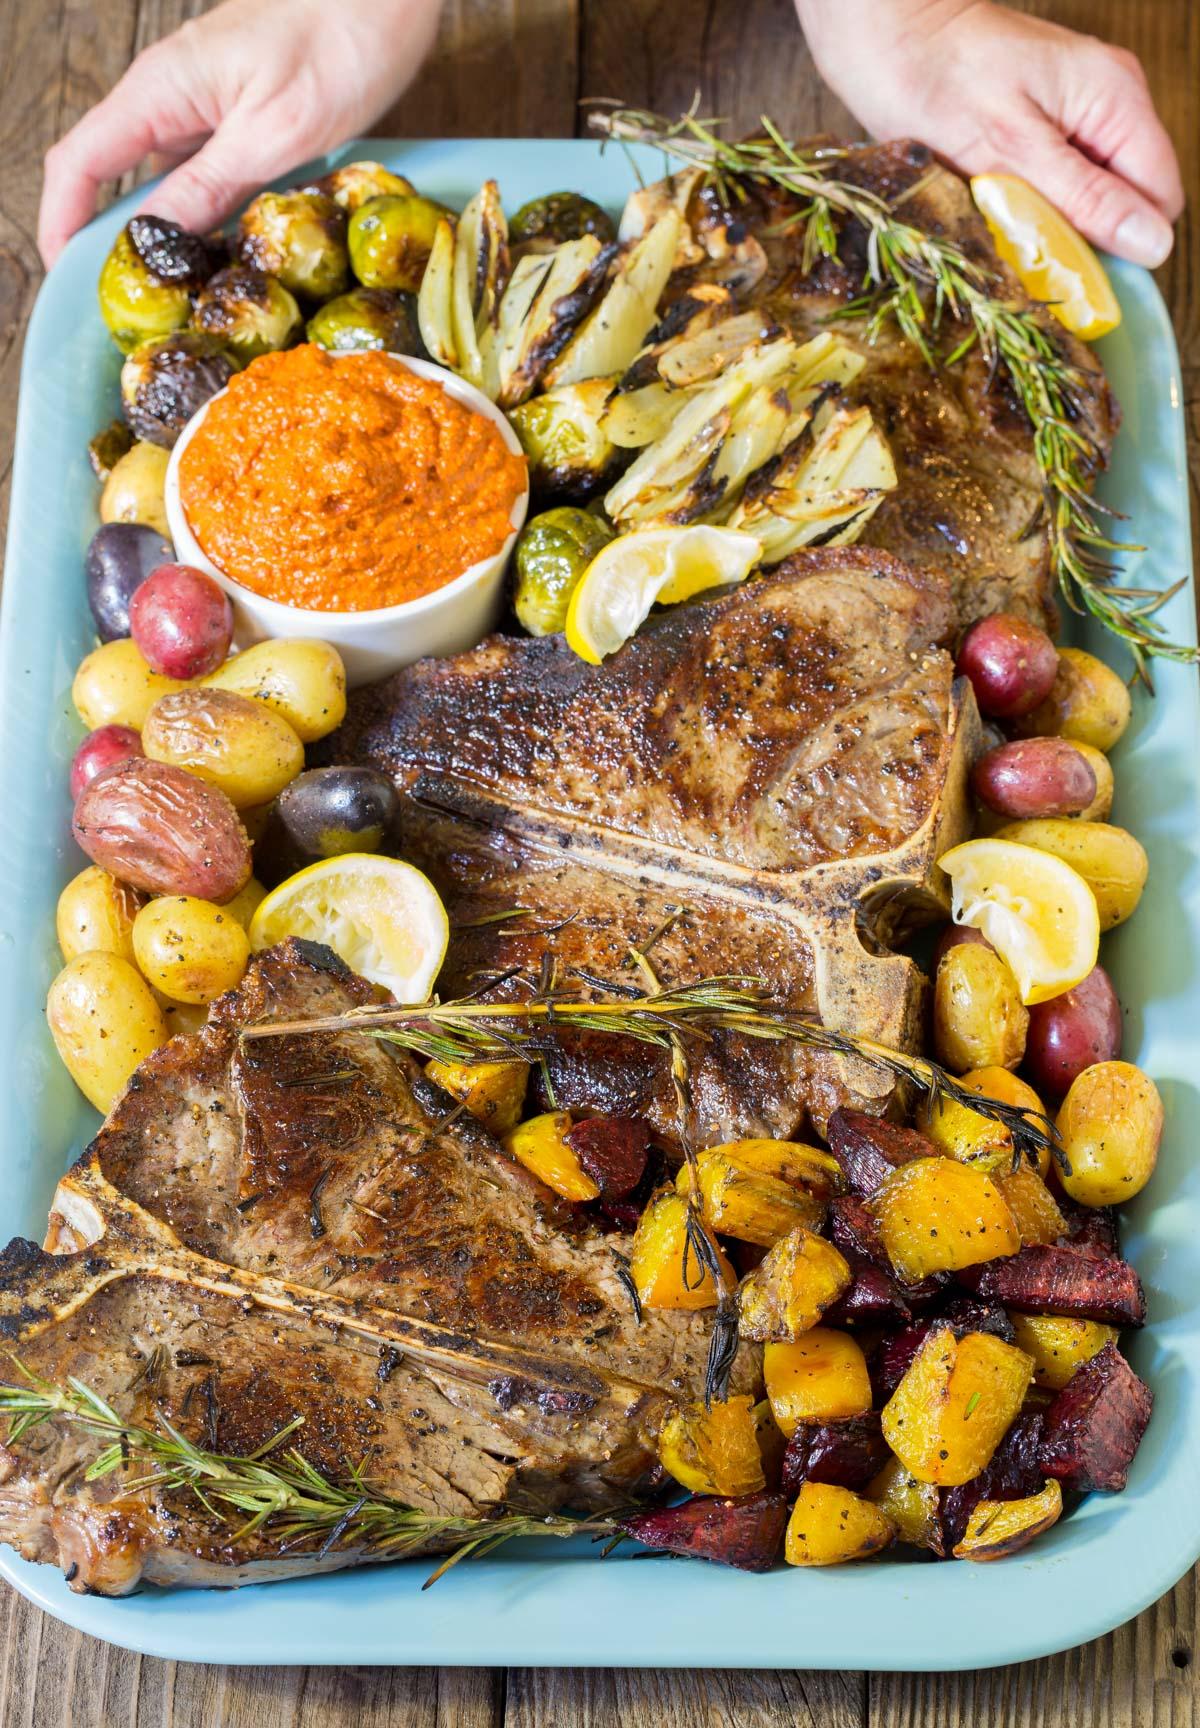 Tuscan Bistecca alla Fiorentina Recipe (Florentine Steak Platter) #ASpicyPerspective